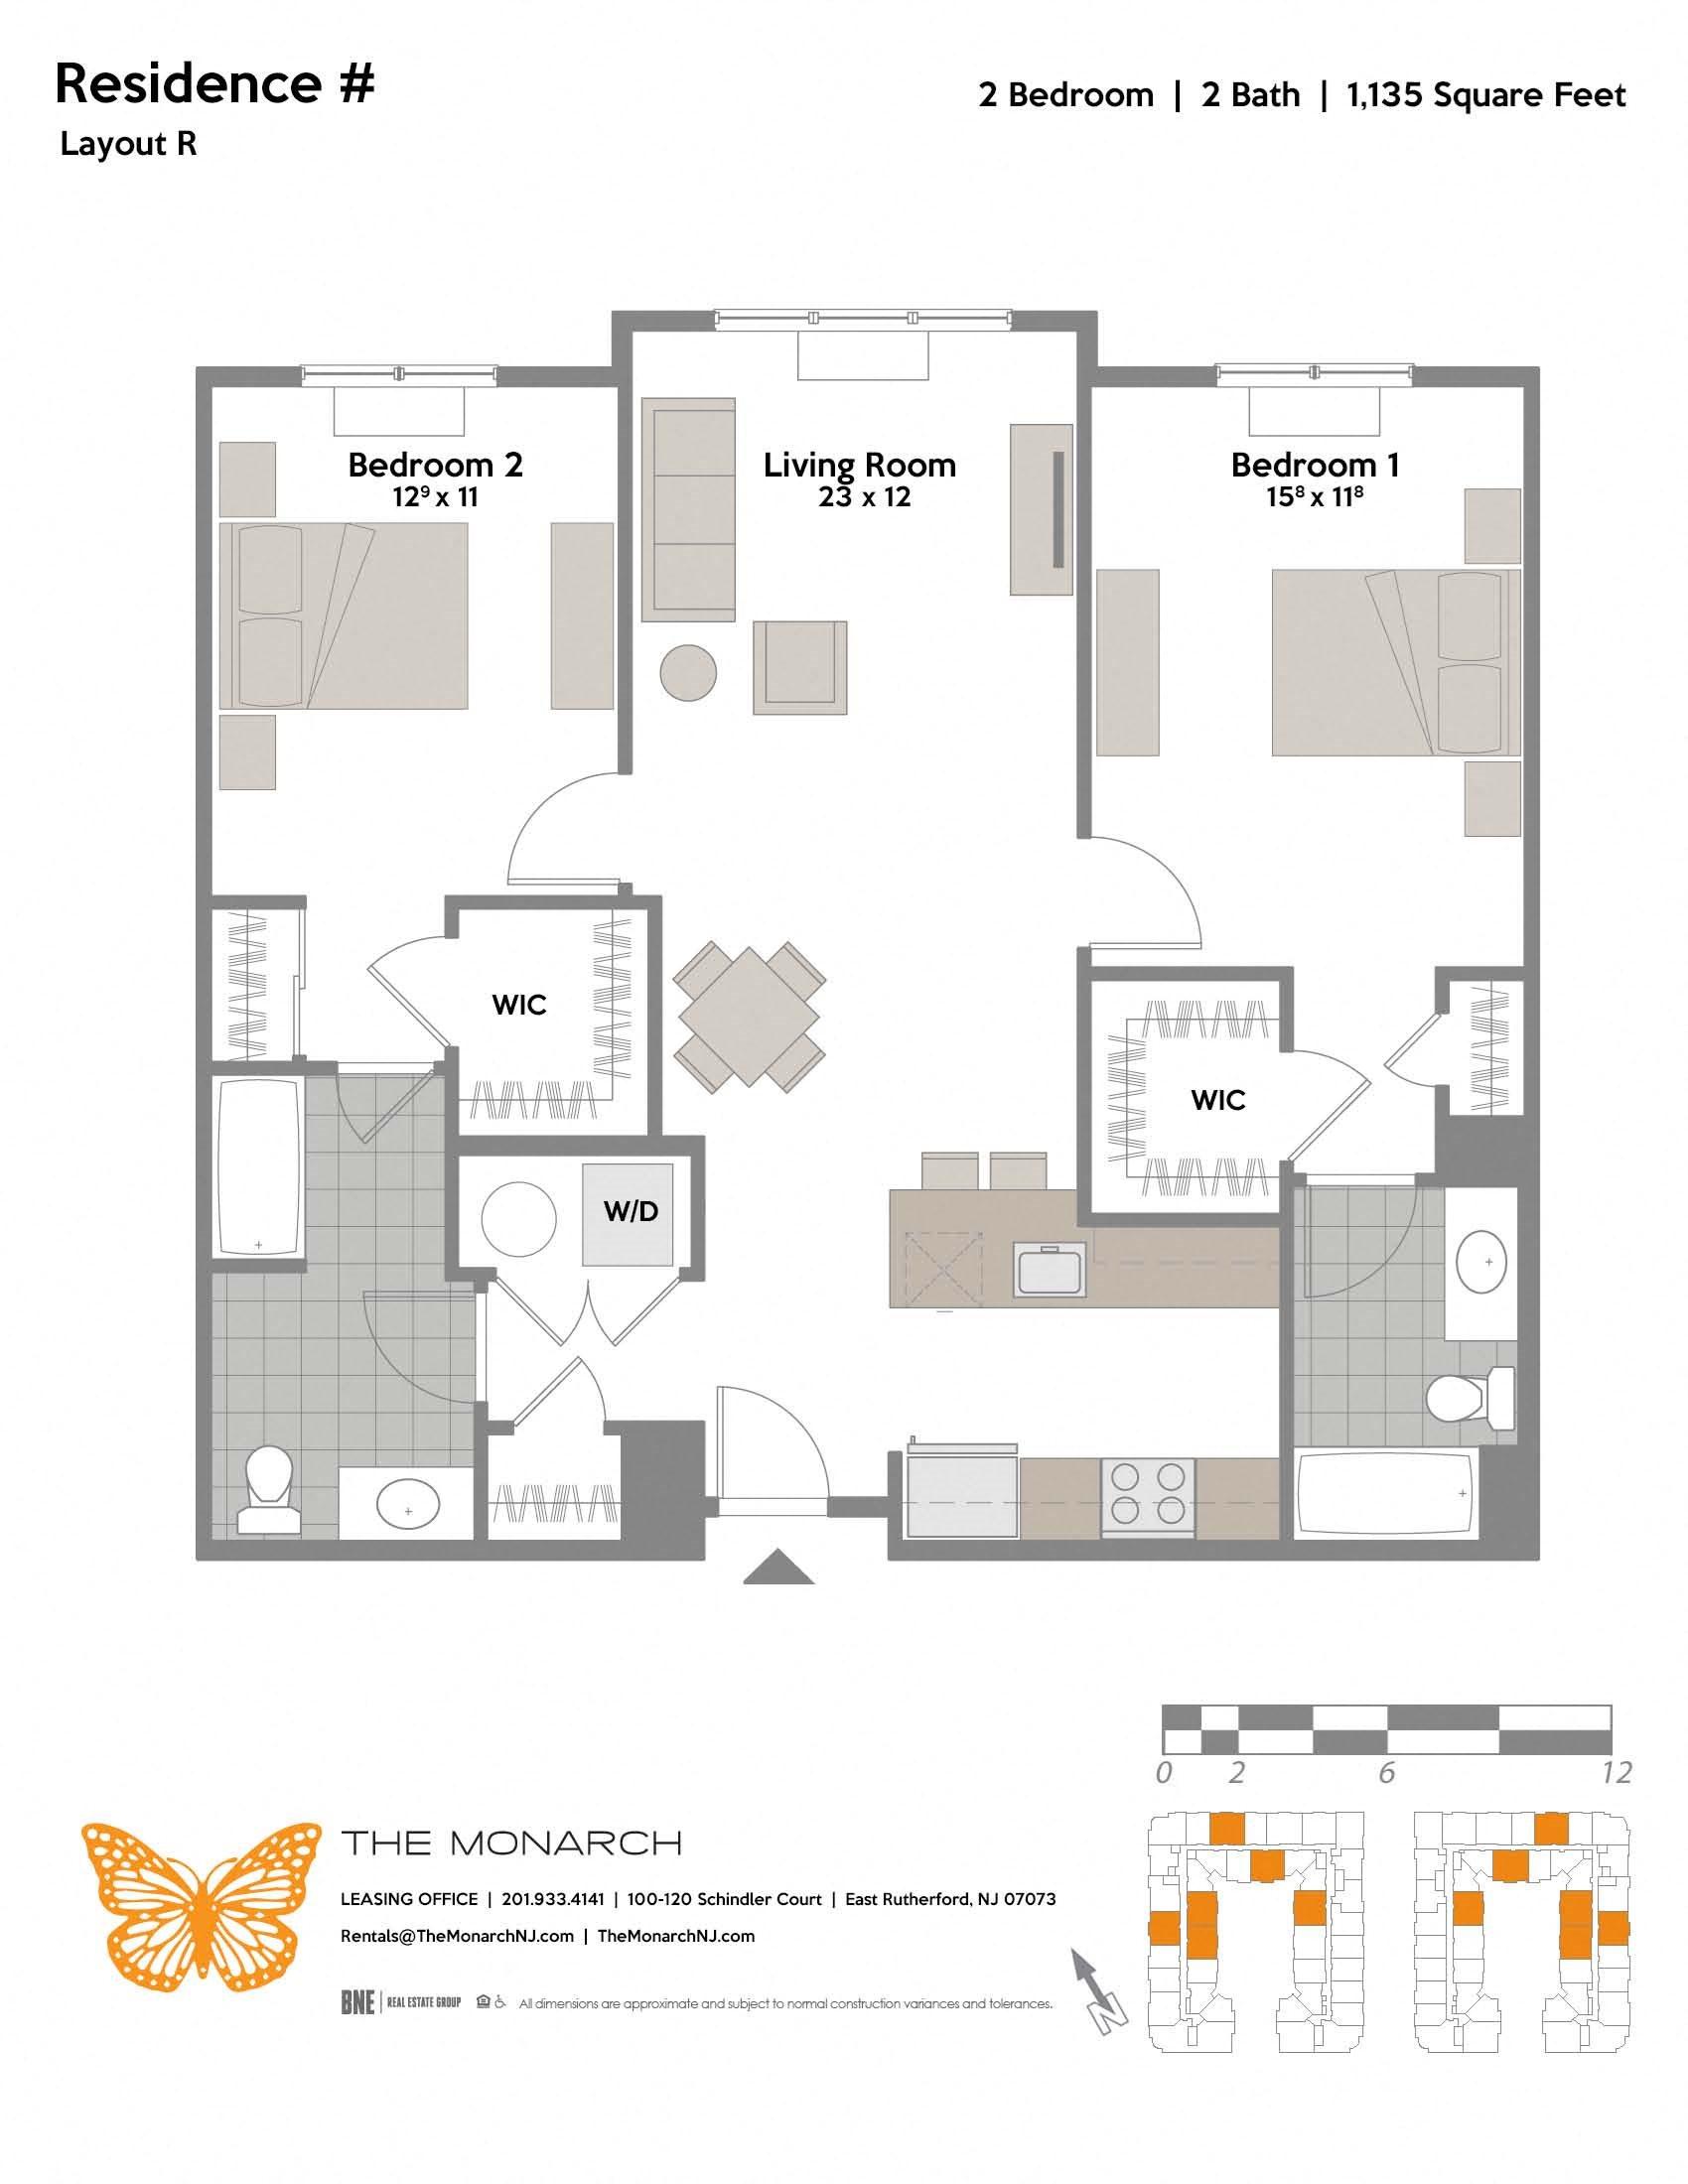 Layout R Floor Plan 5